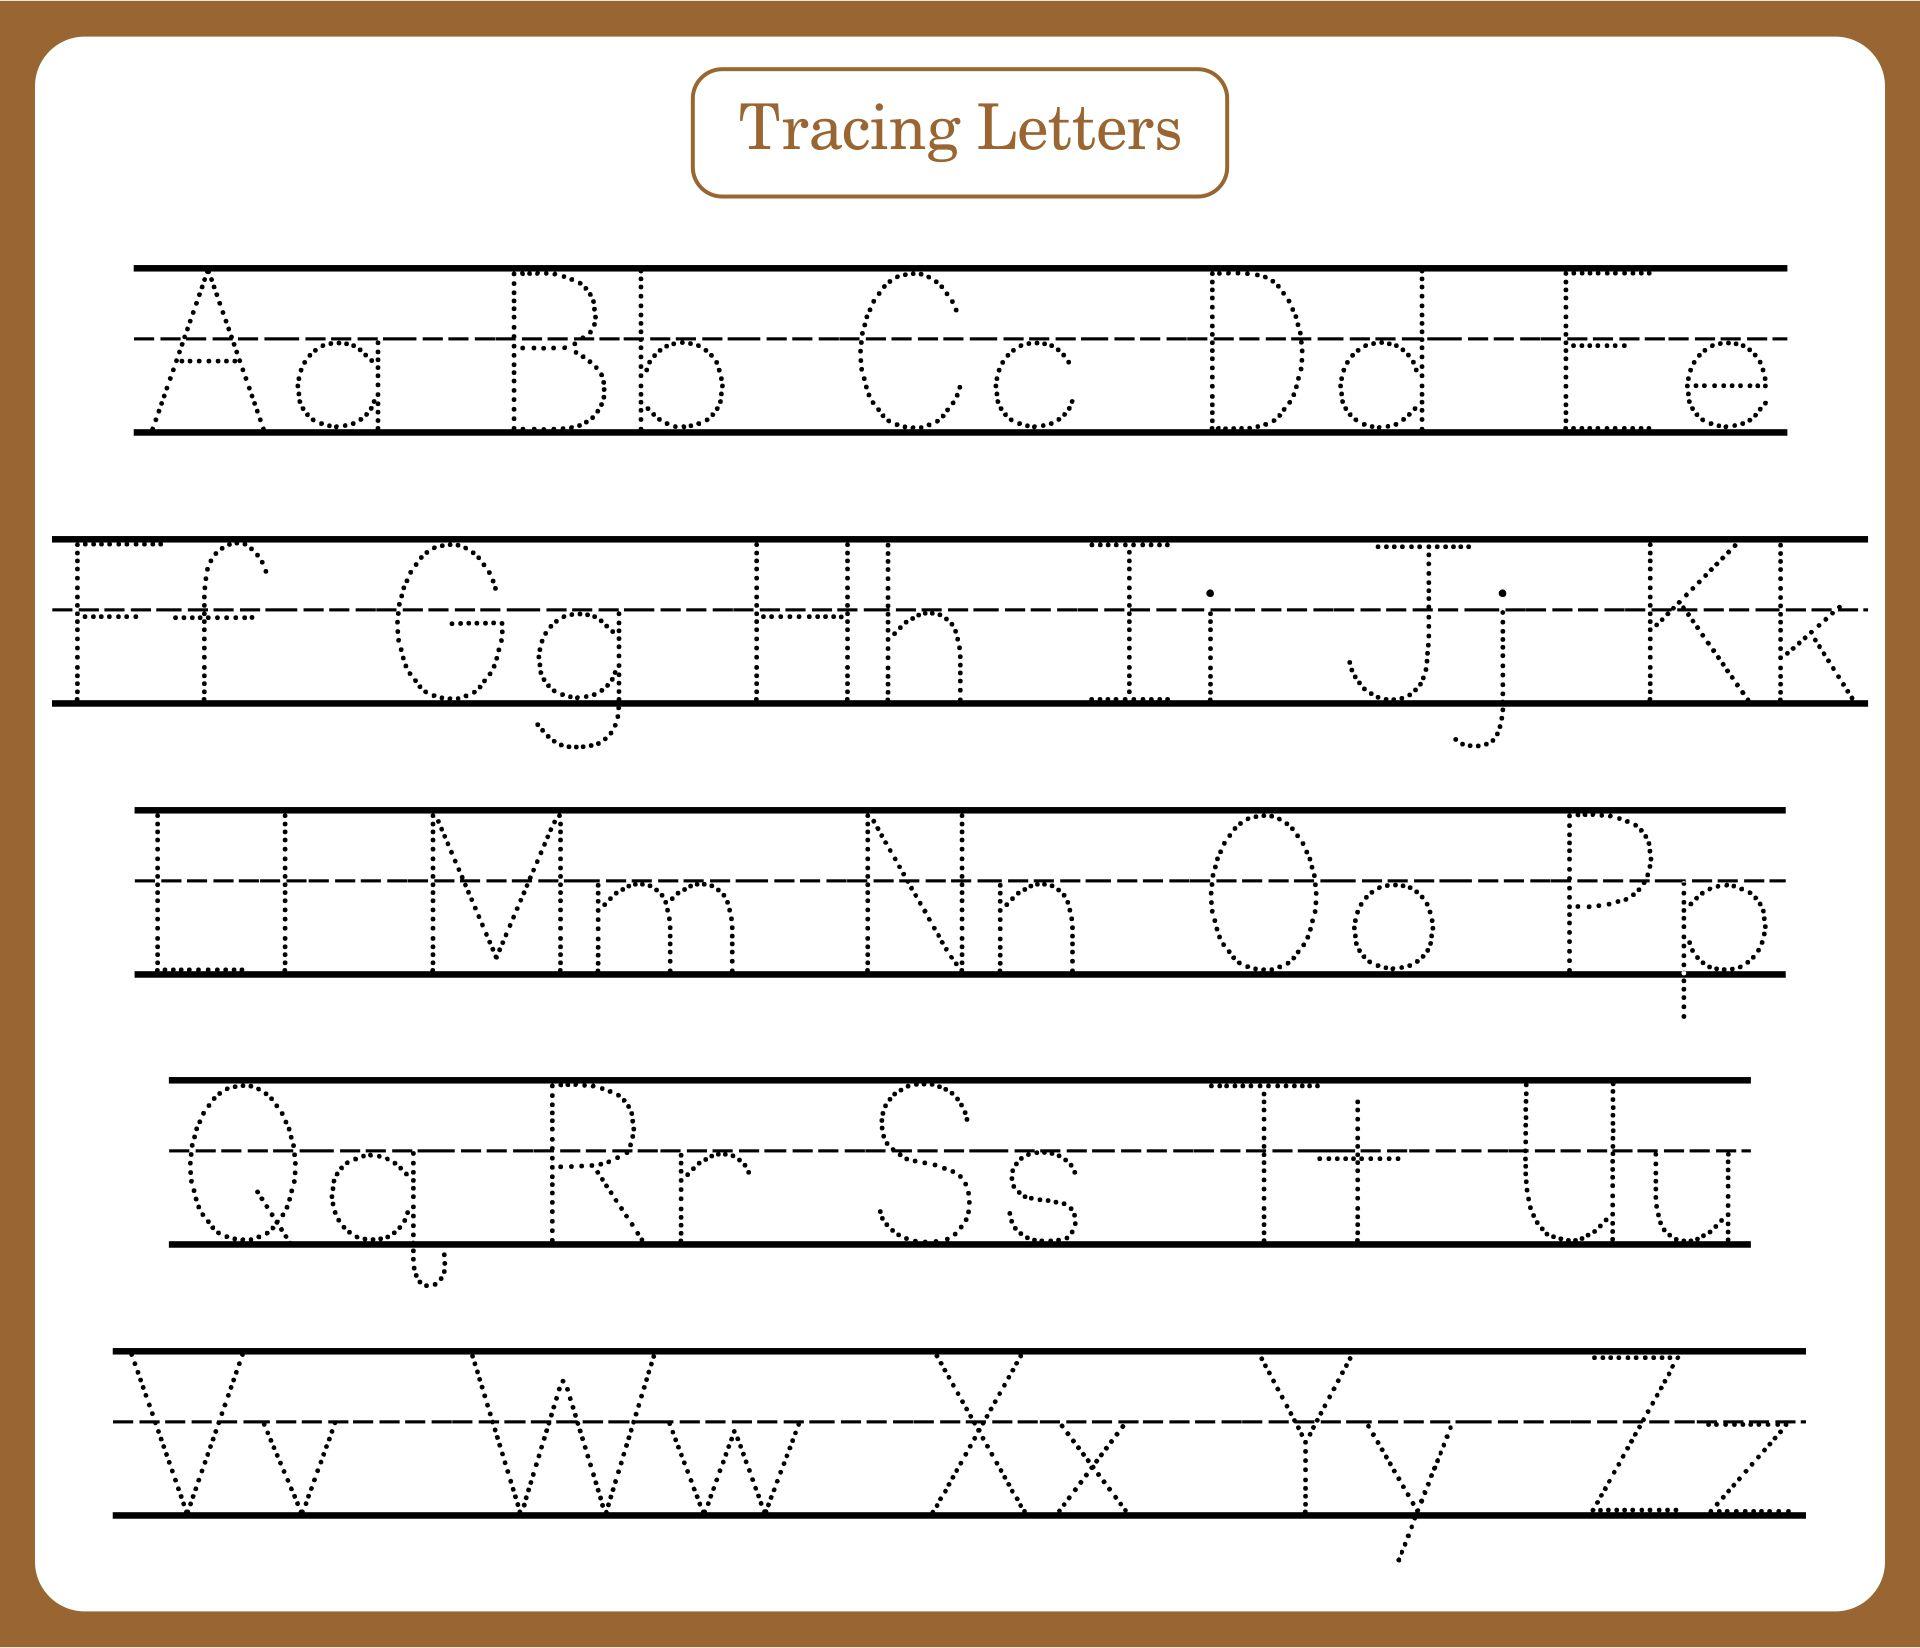 Number Names Worksheets preschool alphabet tracing : Free Alphabet Tracing Worksheets For Preschoolers - Intrepidpath